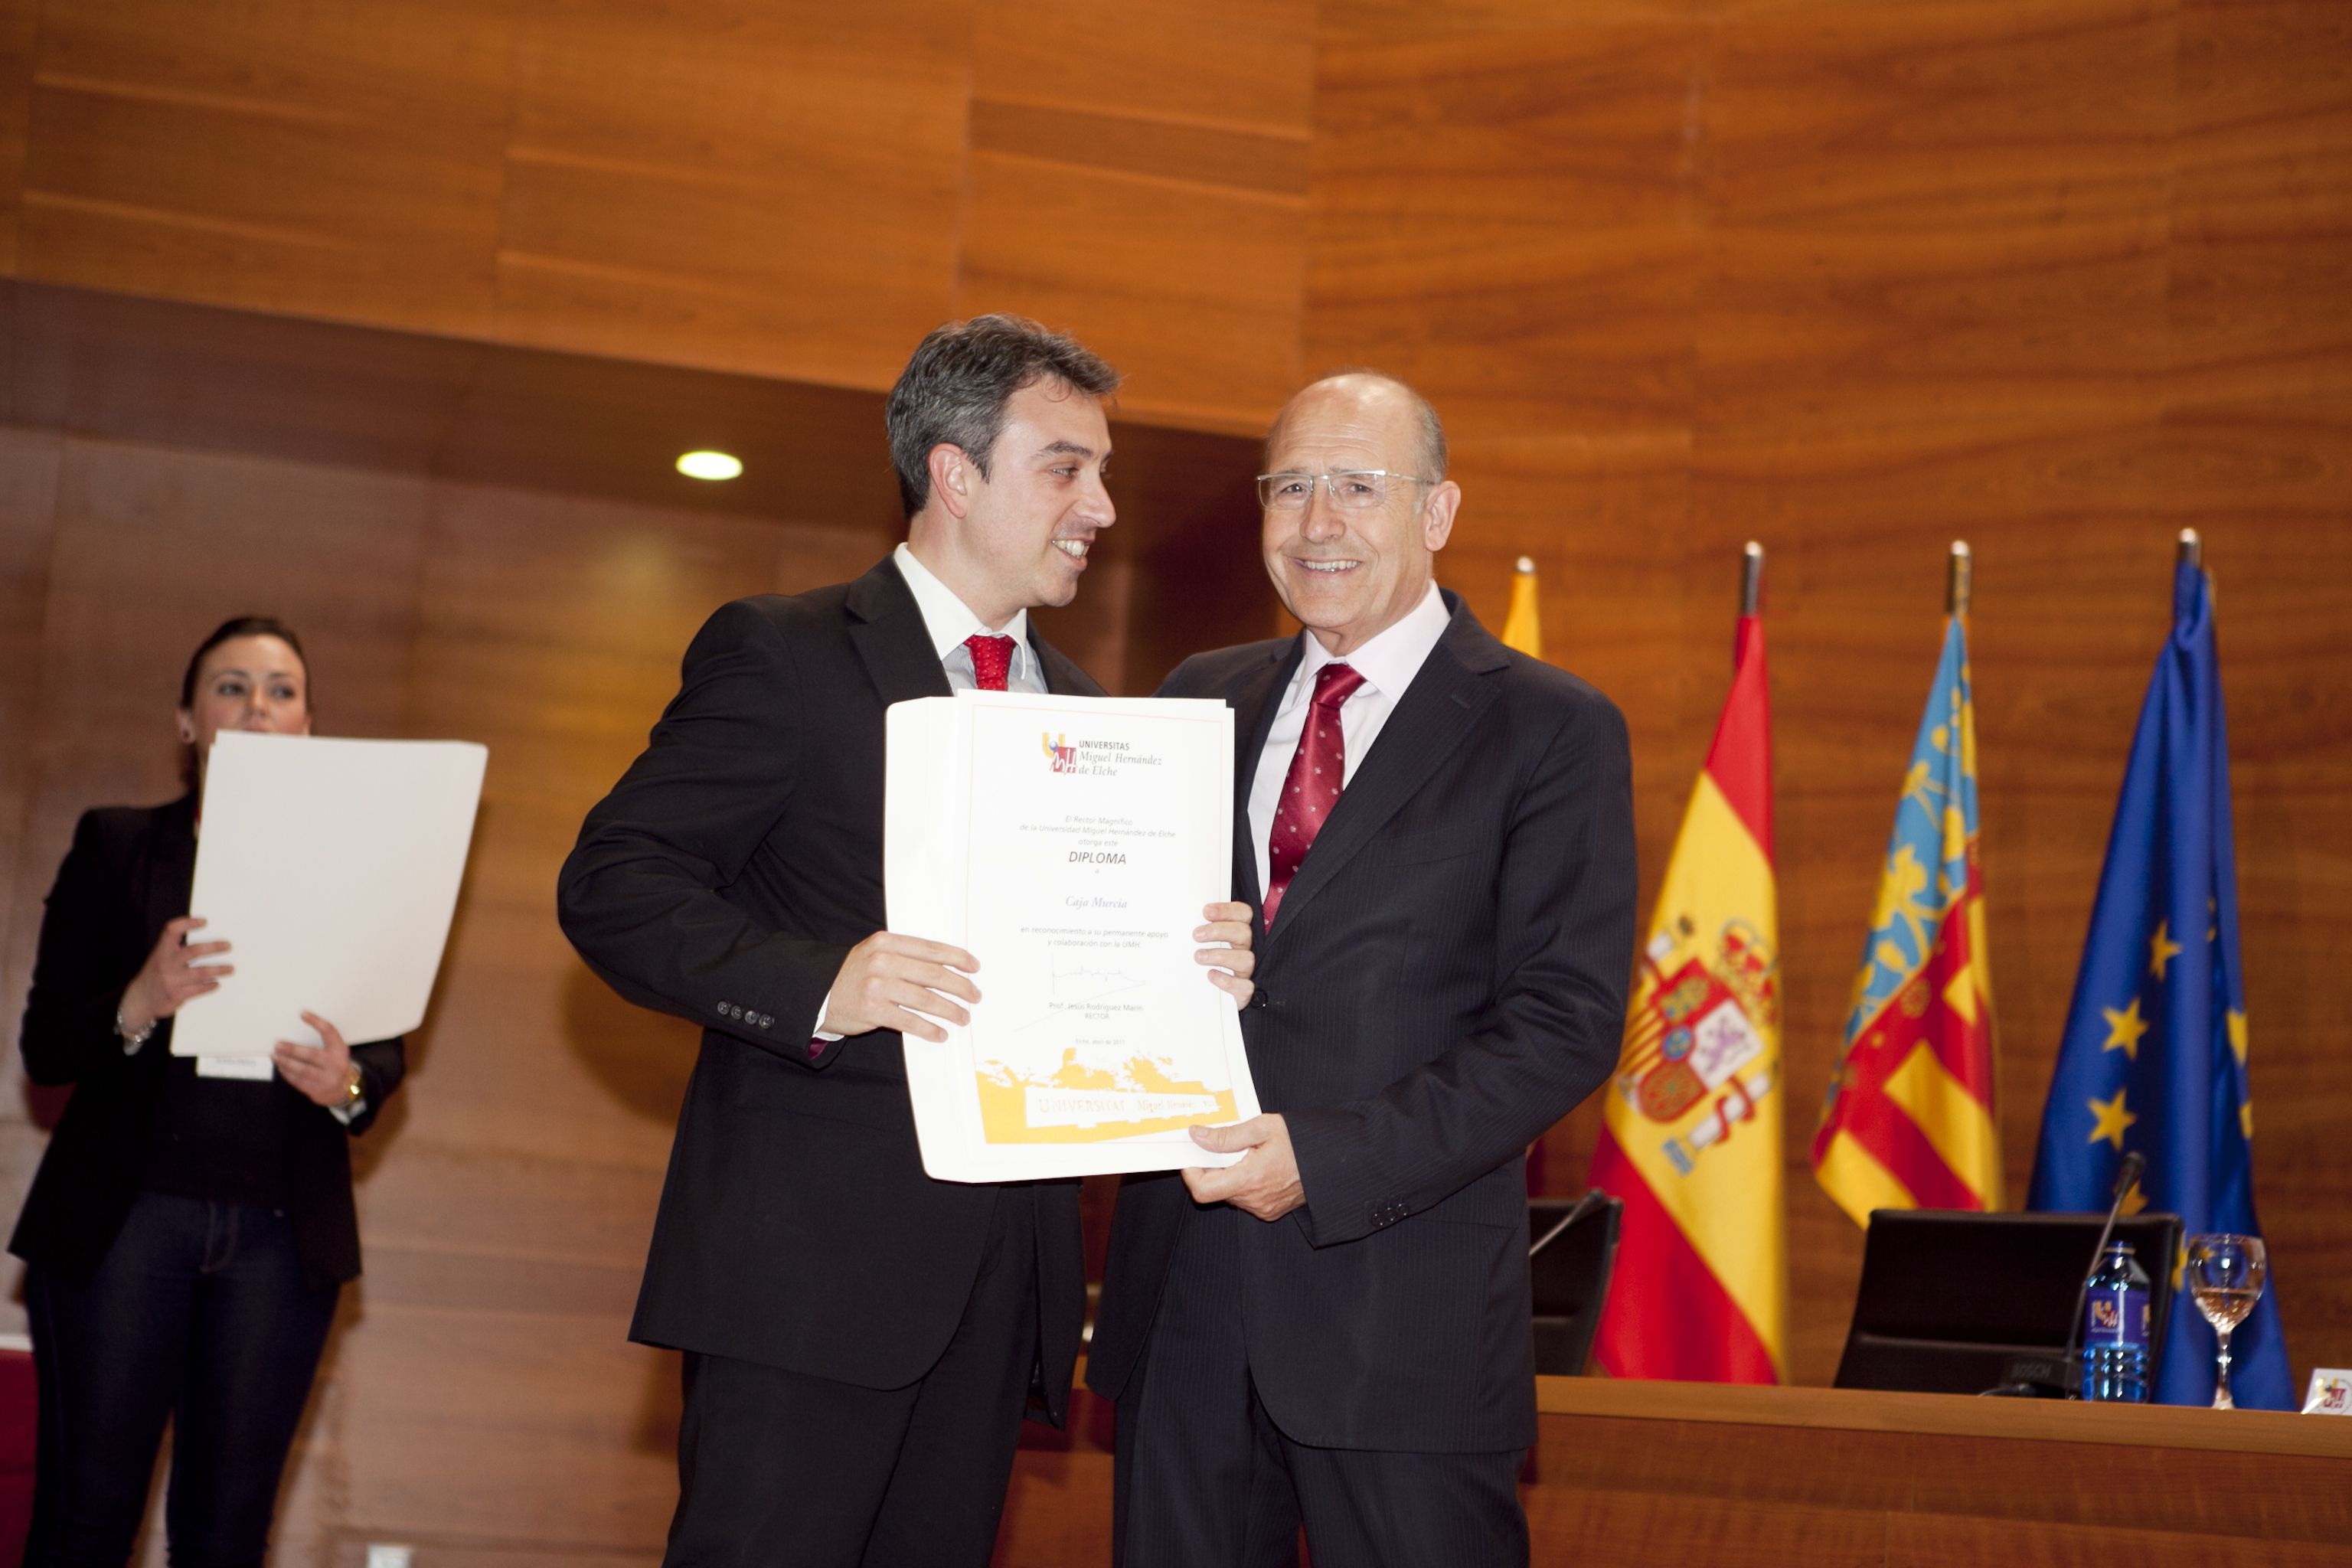 umh-diplomas-rector_mg_6955.jpg